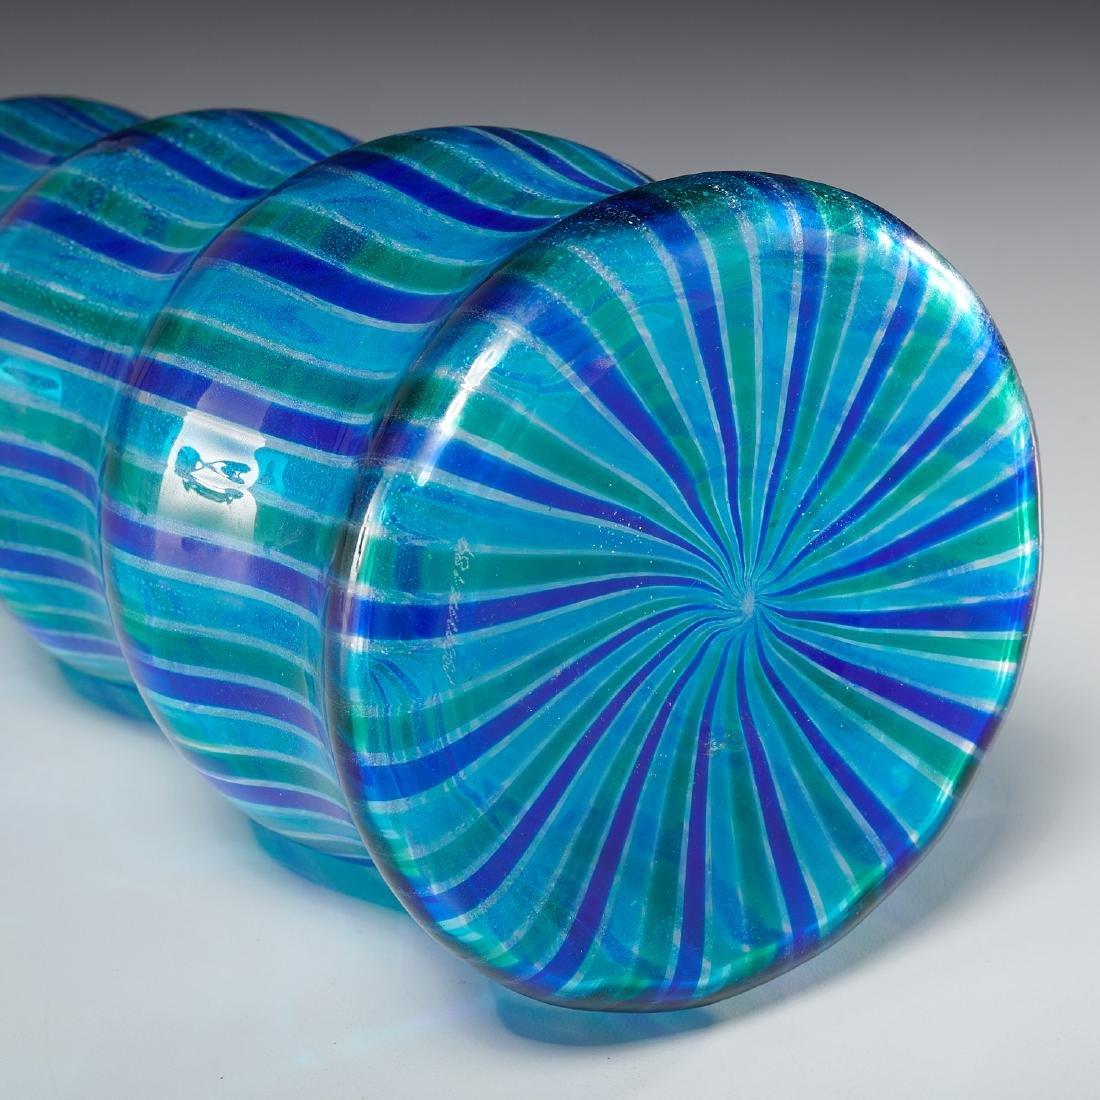 Alessandro Mendini 'Arado' vase for Venini - 4